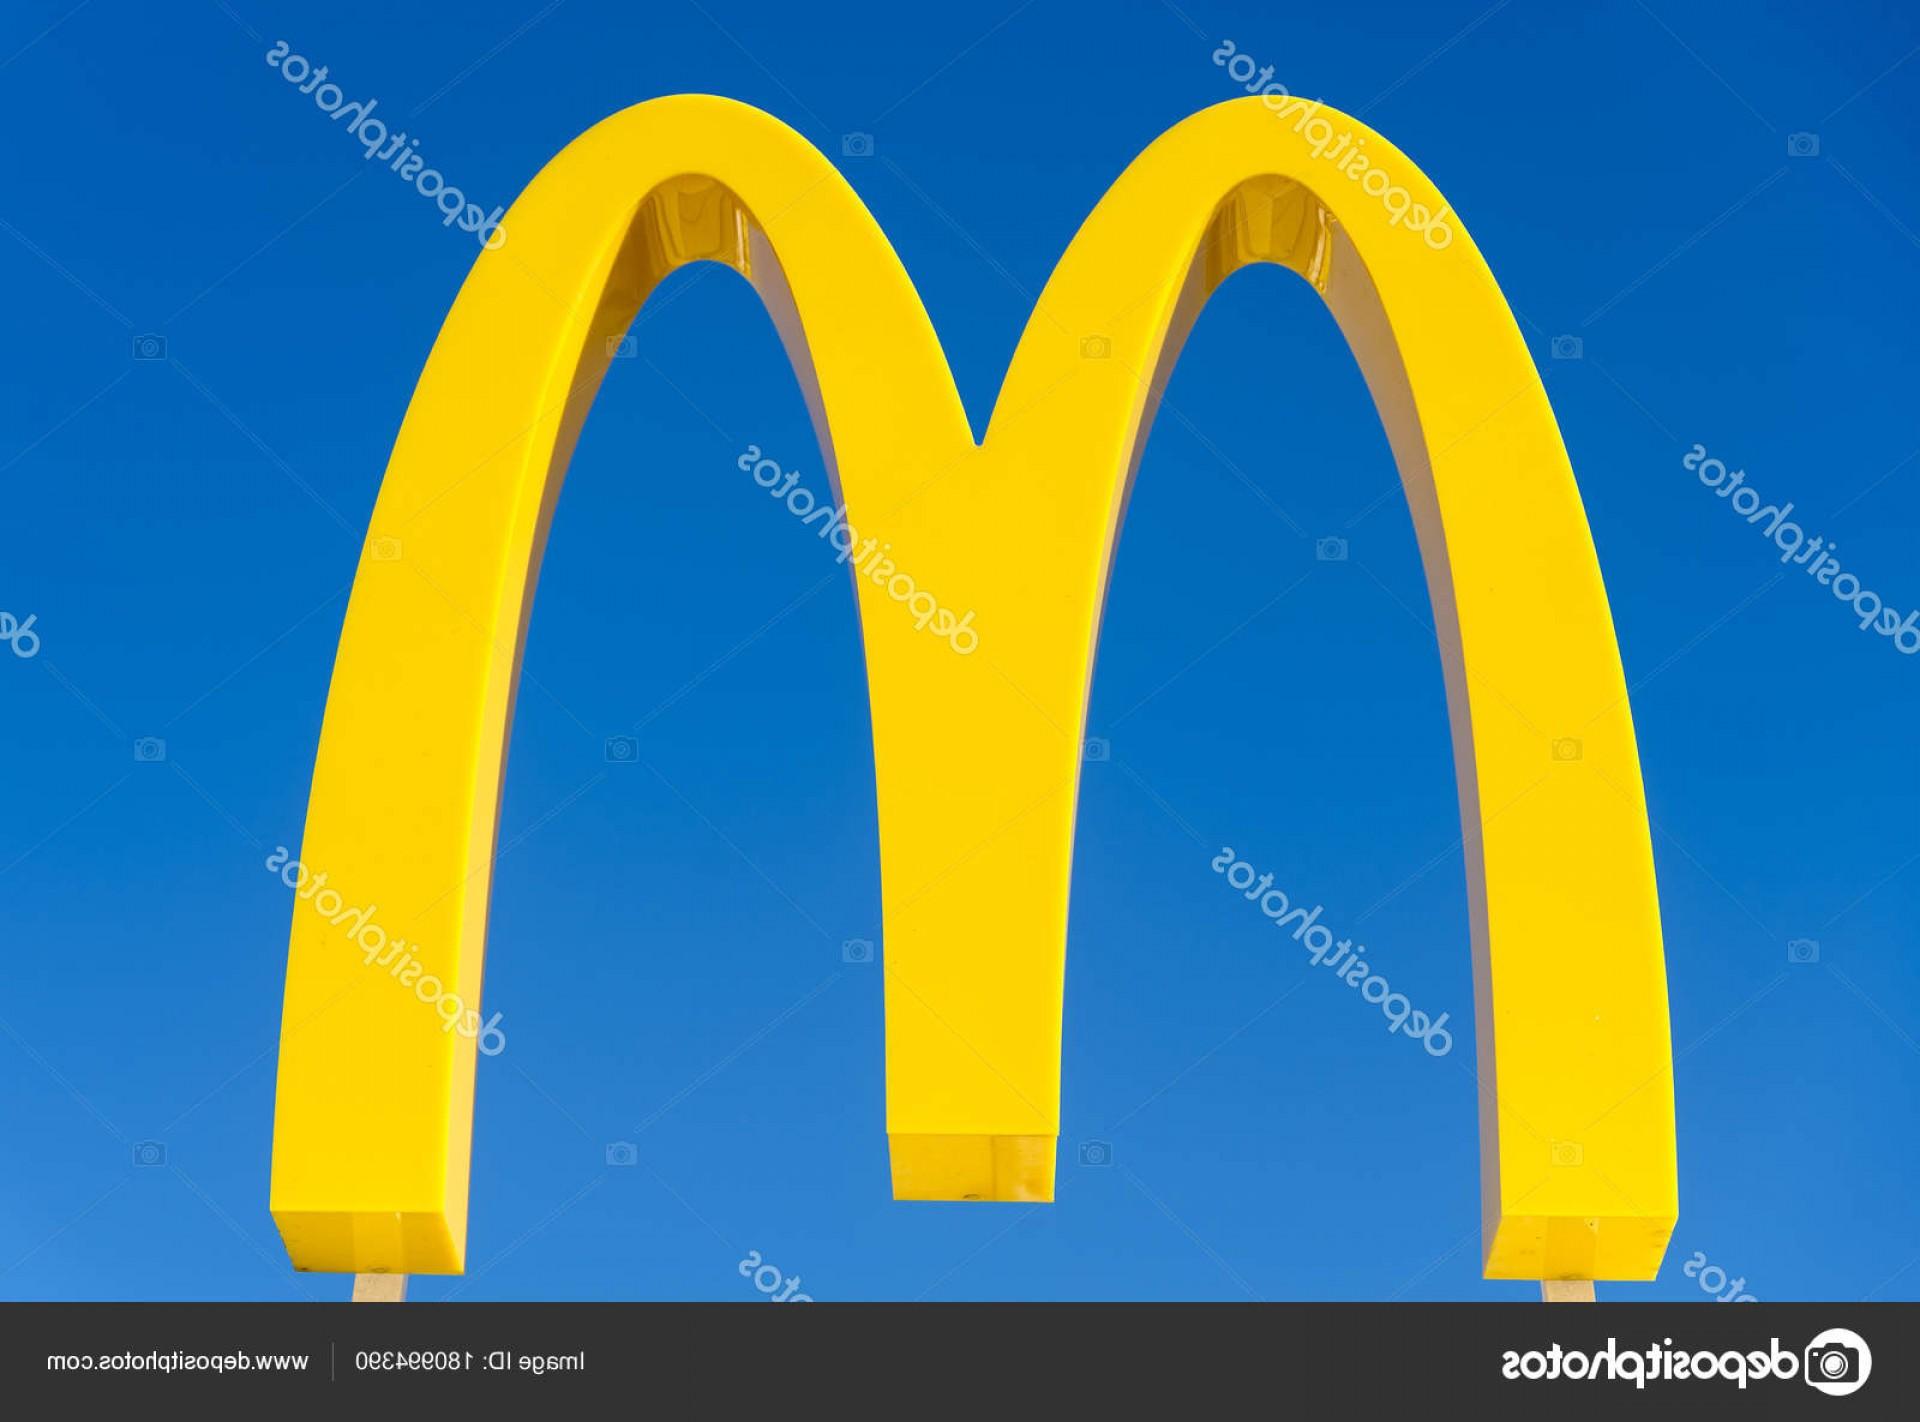 1920x1422 Stock Photo Mcdonald Logo Blue Sky January Lazttweet